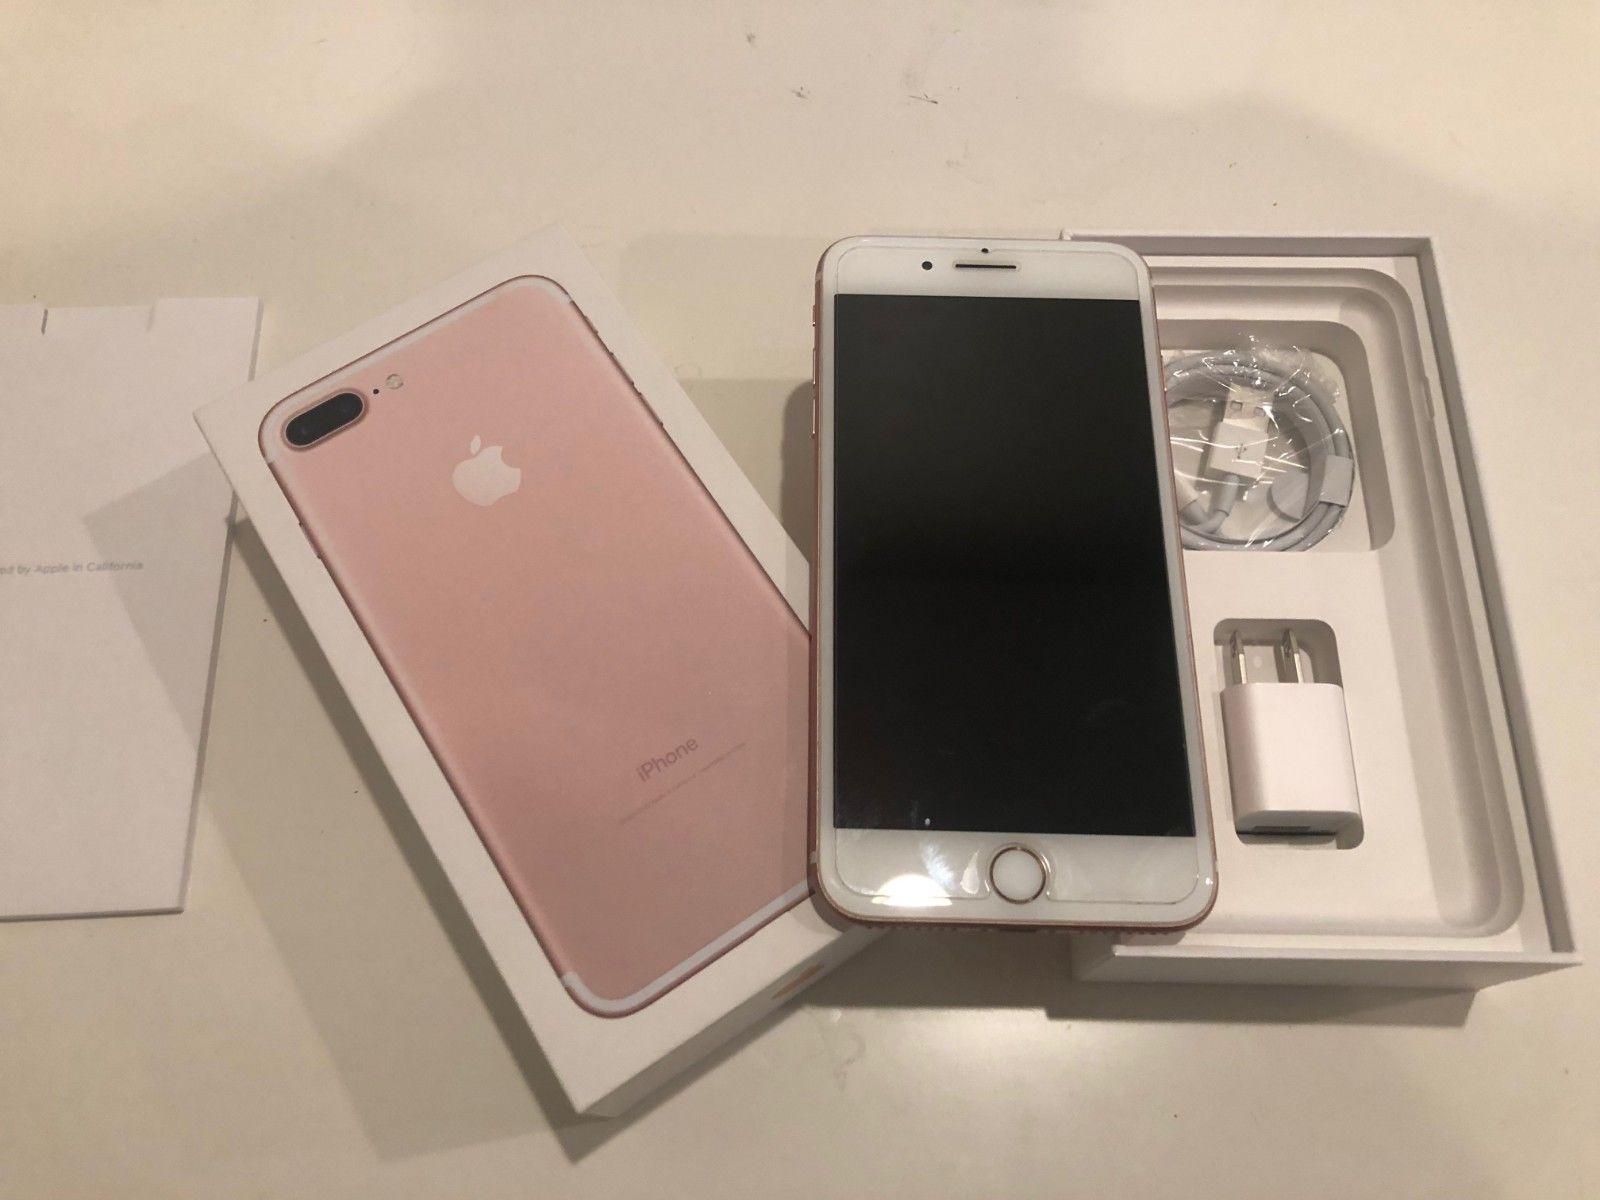 Apple Iphone 7 Plus - Iphone 7 Plus 128g Rose Gold - HD Wallpaper